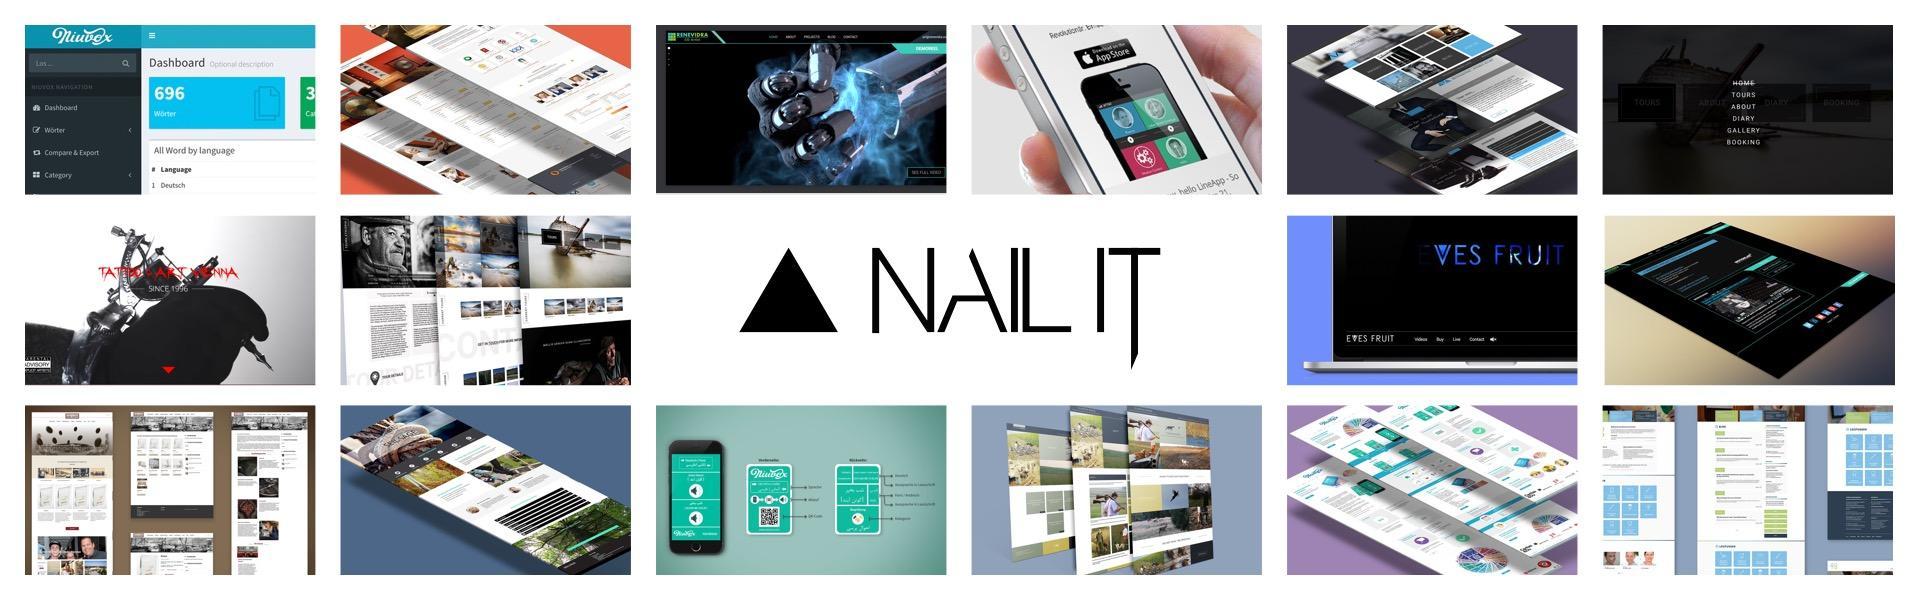 Nail IT - Wordpress Kurse cover